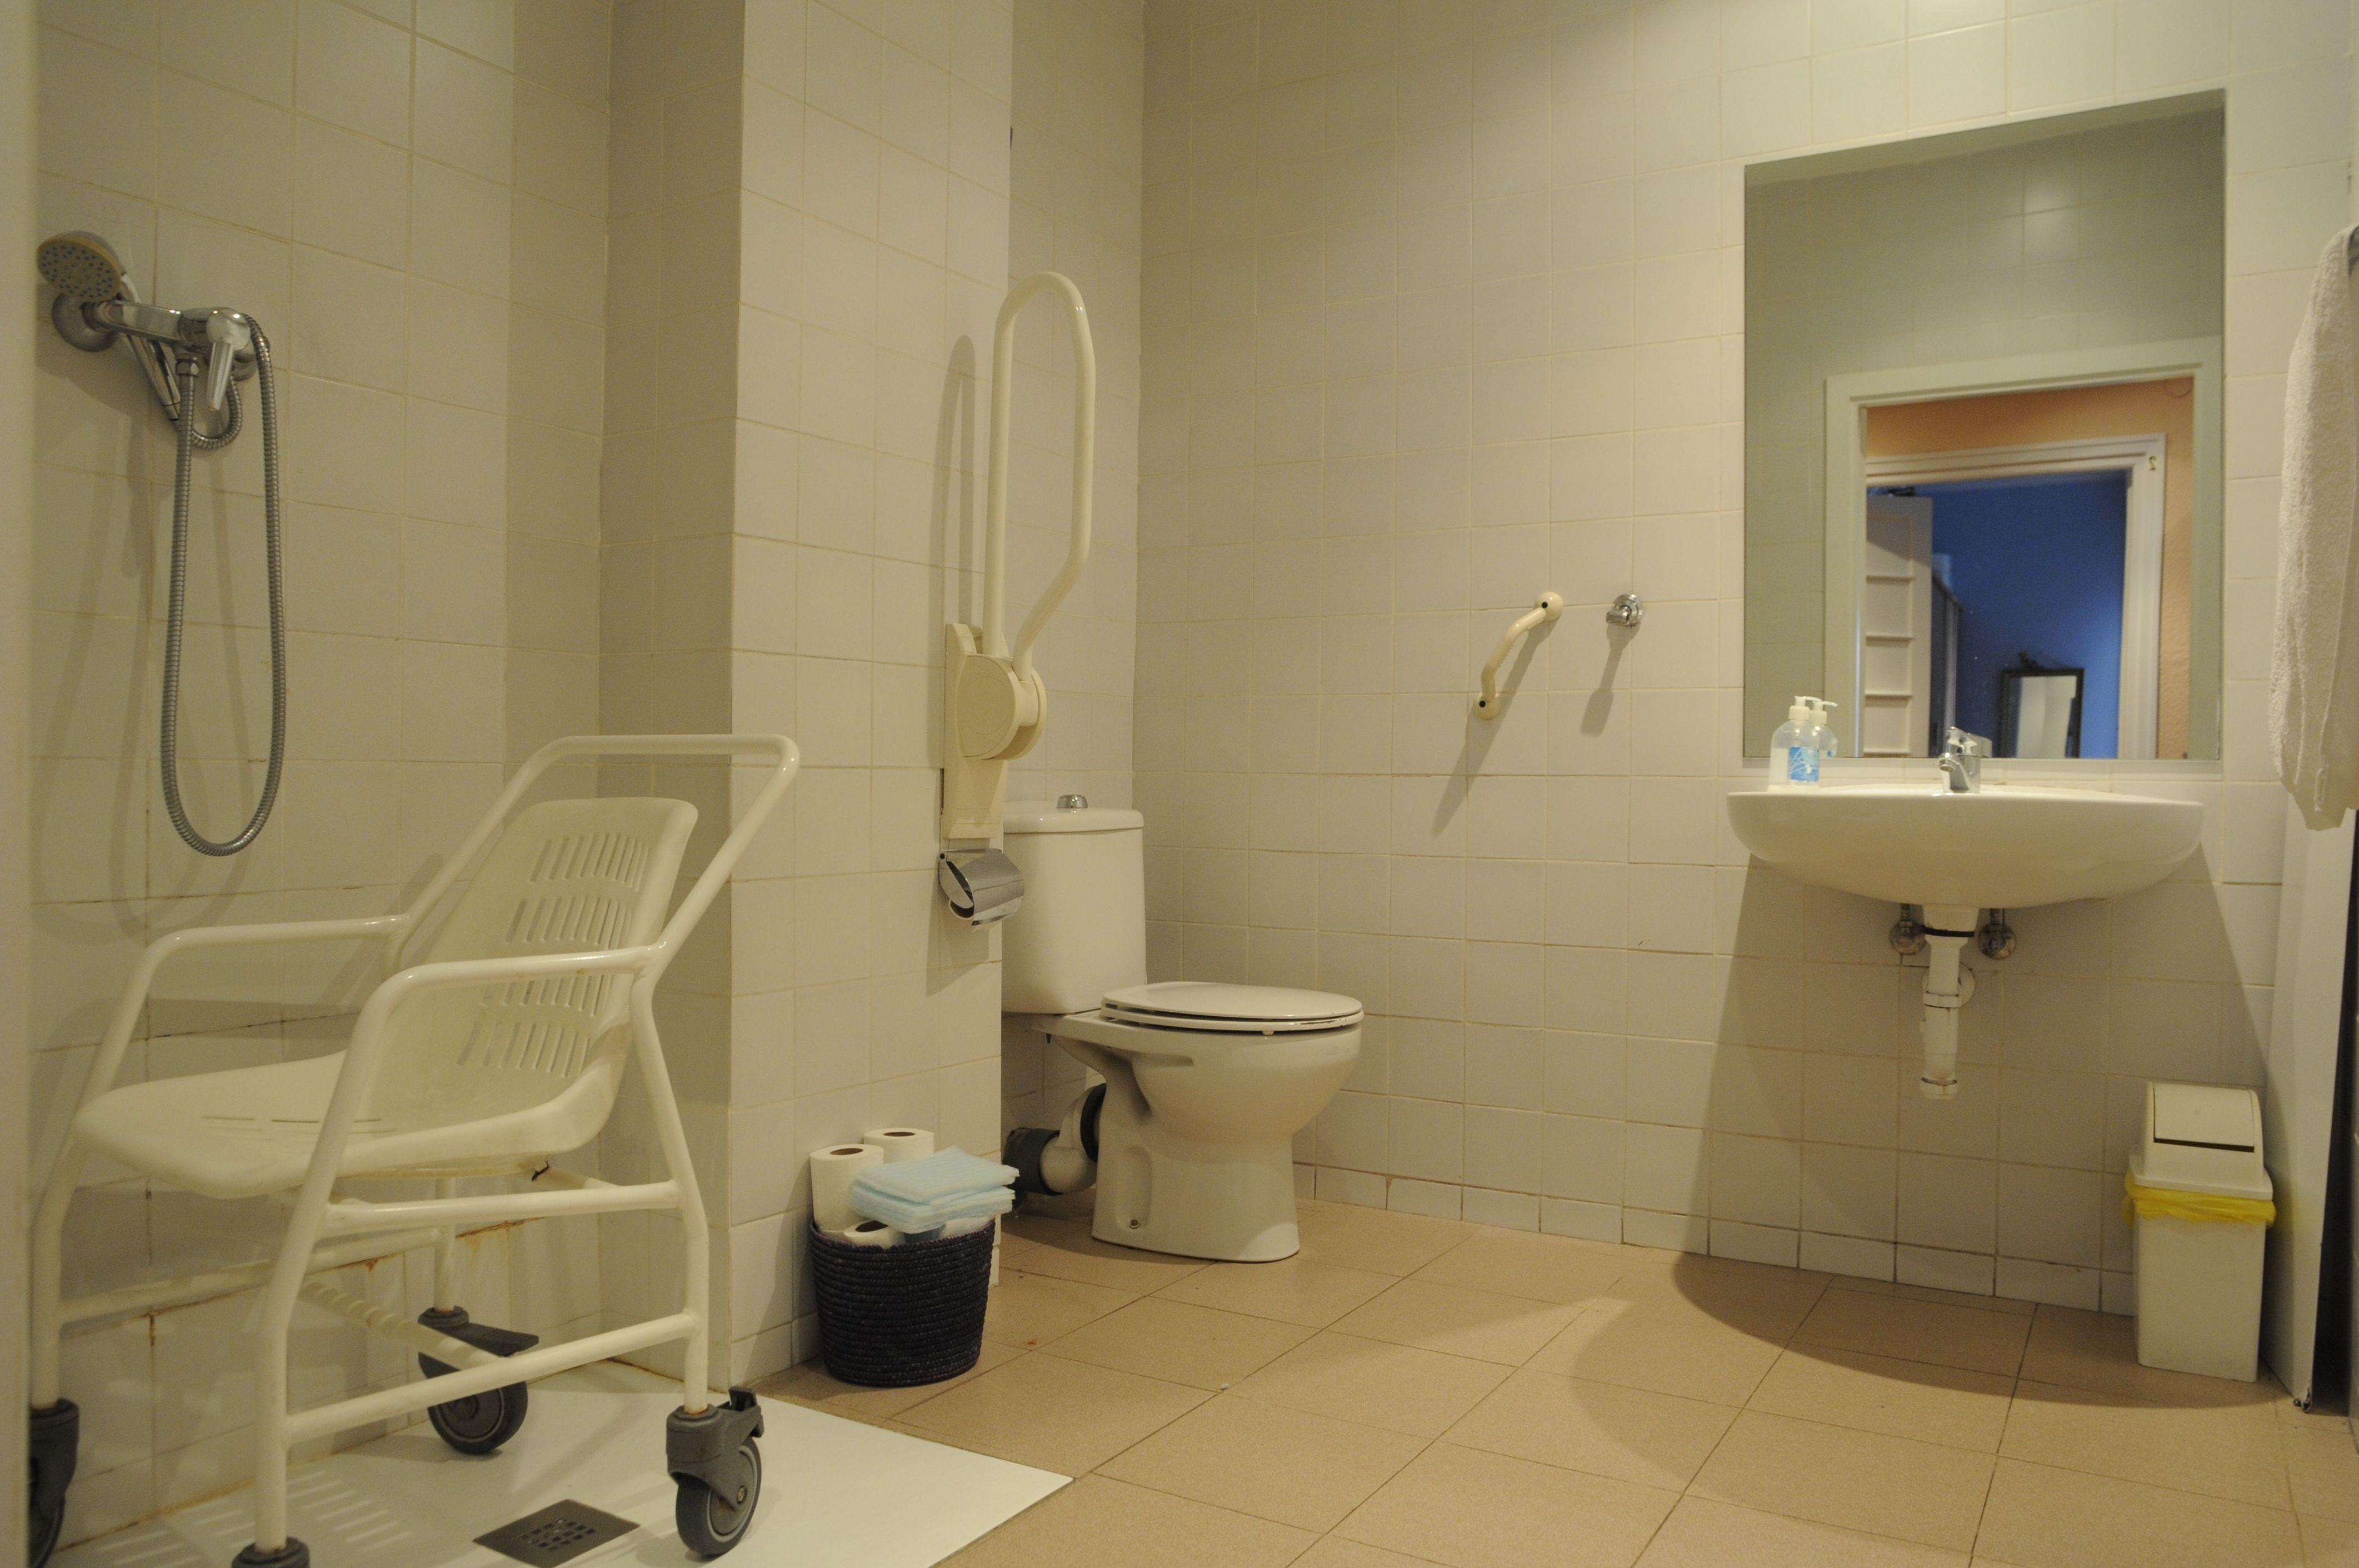 Foto 37 de Residencia para la tercera edad en Bilbo | Residencia Garai